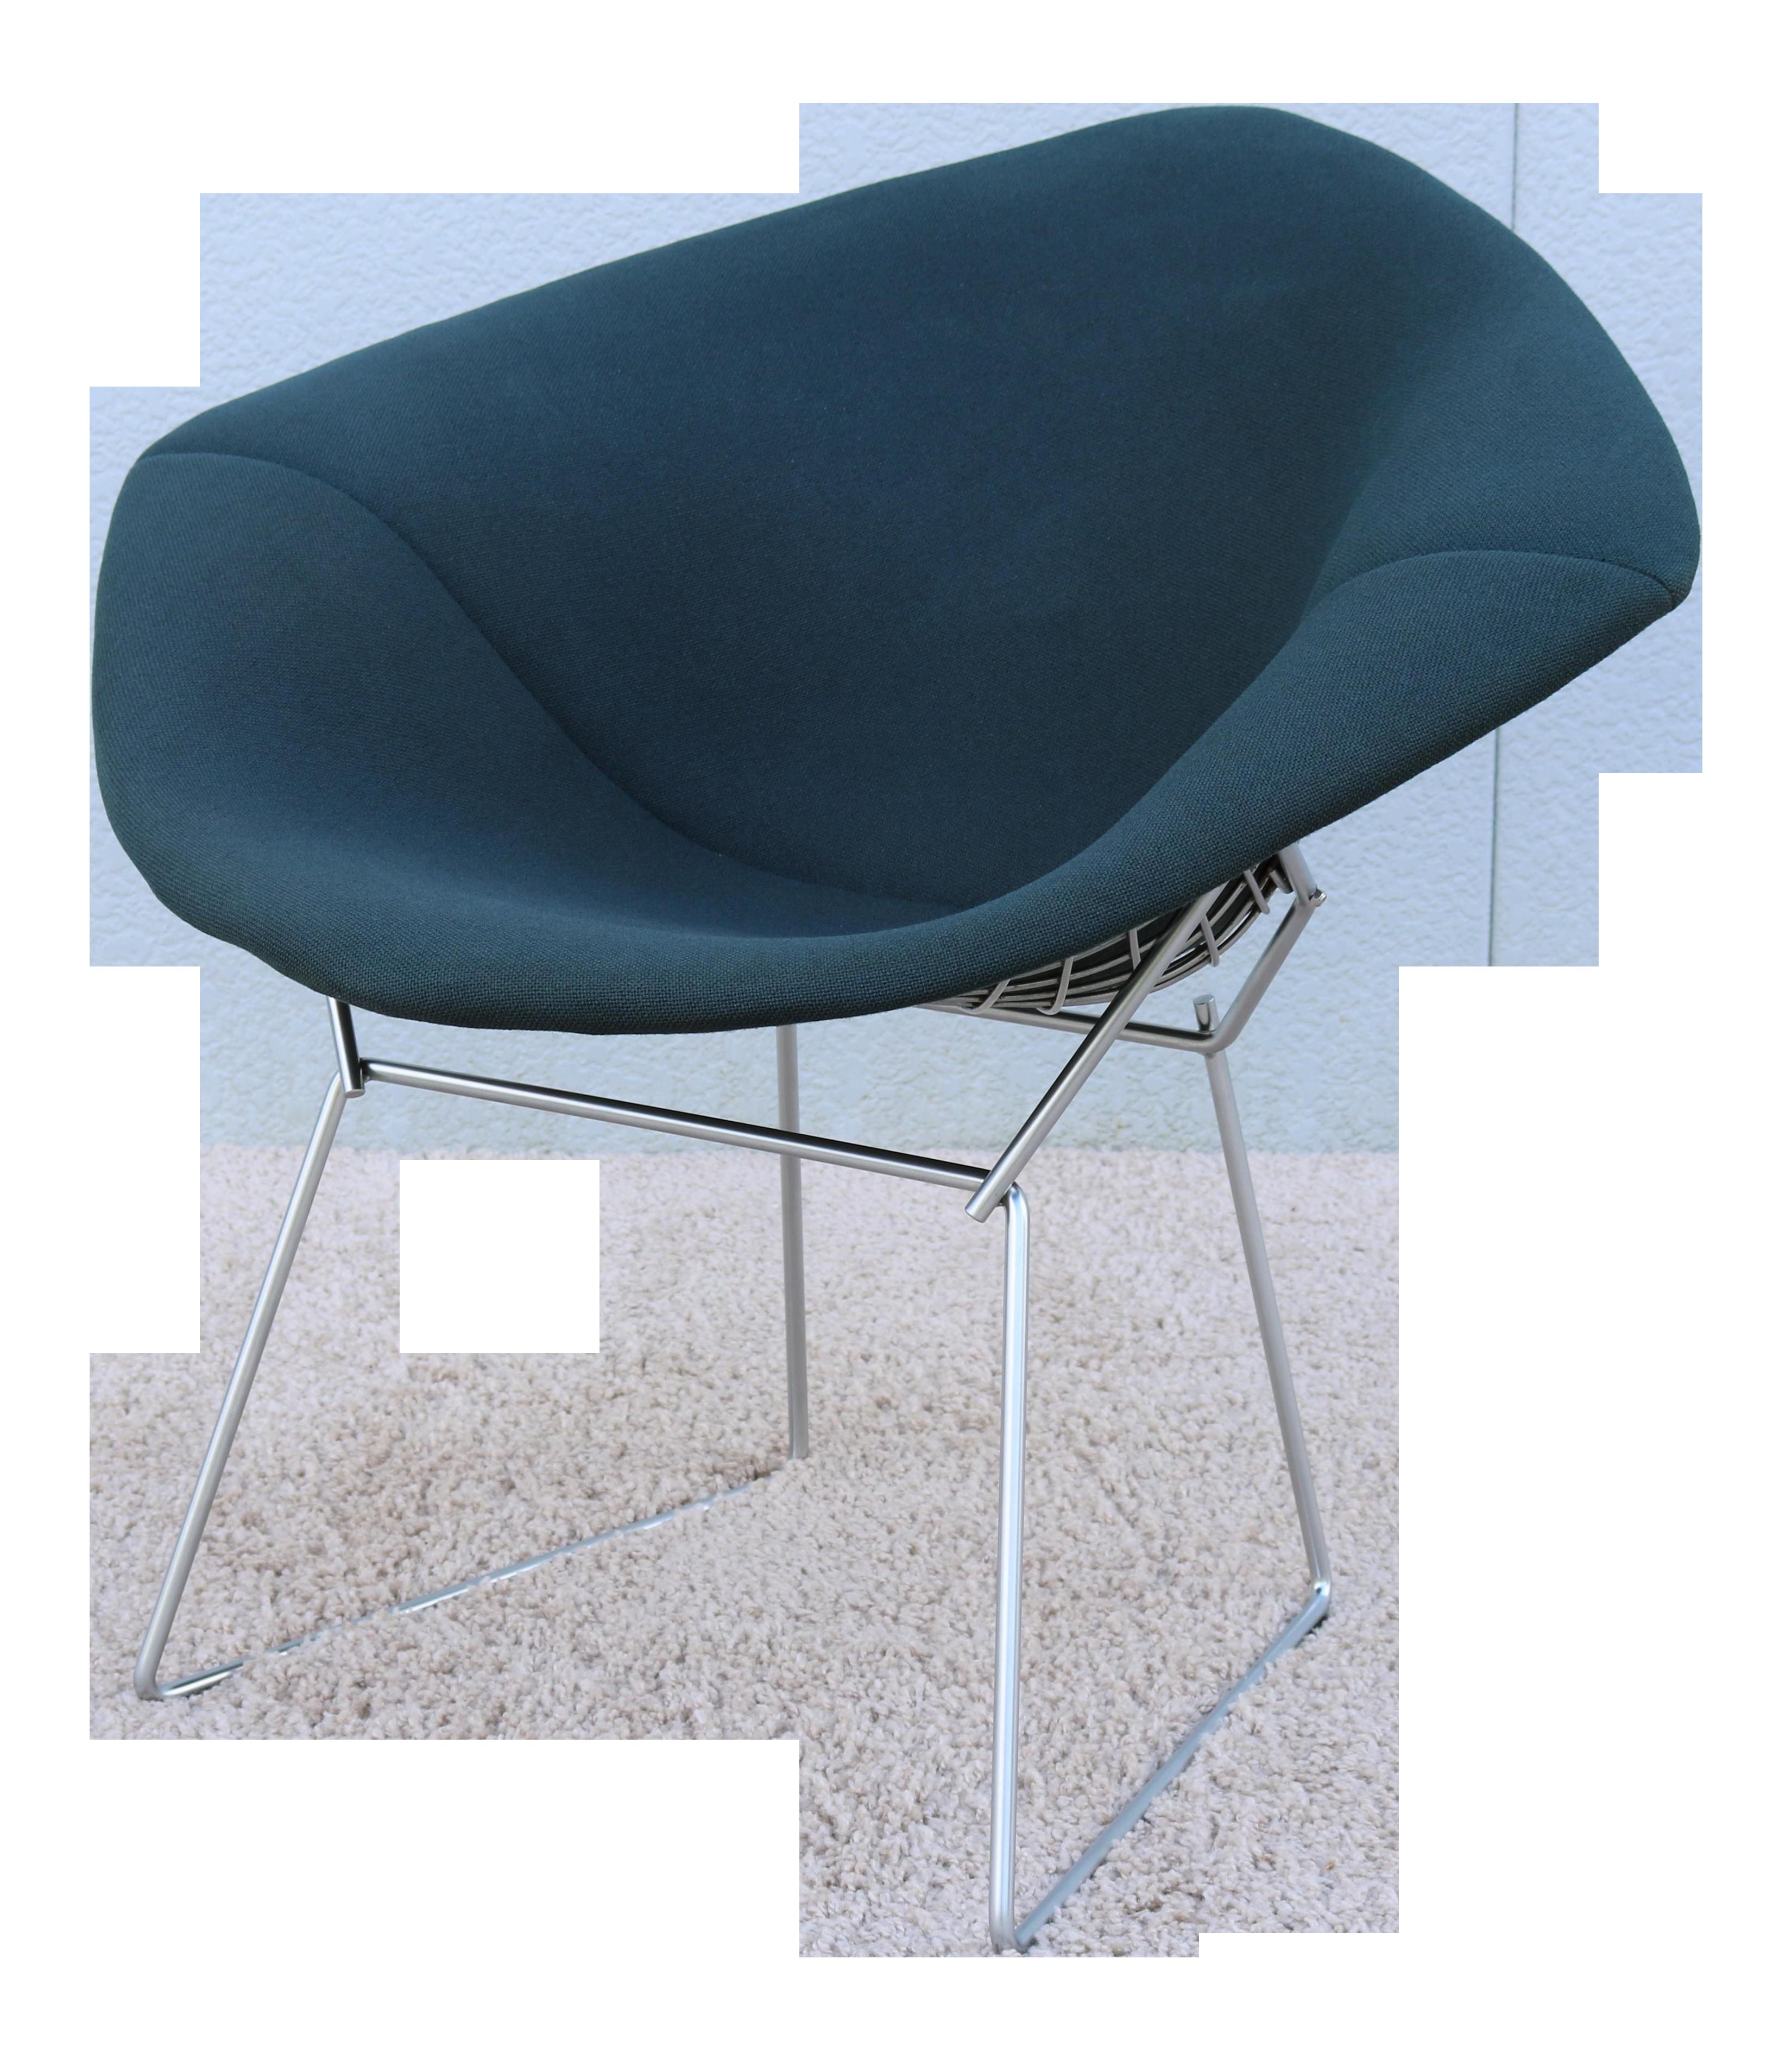 1952 Harry Bertoia Diamond Chair For Knoll